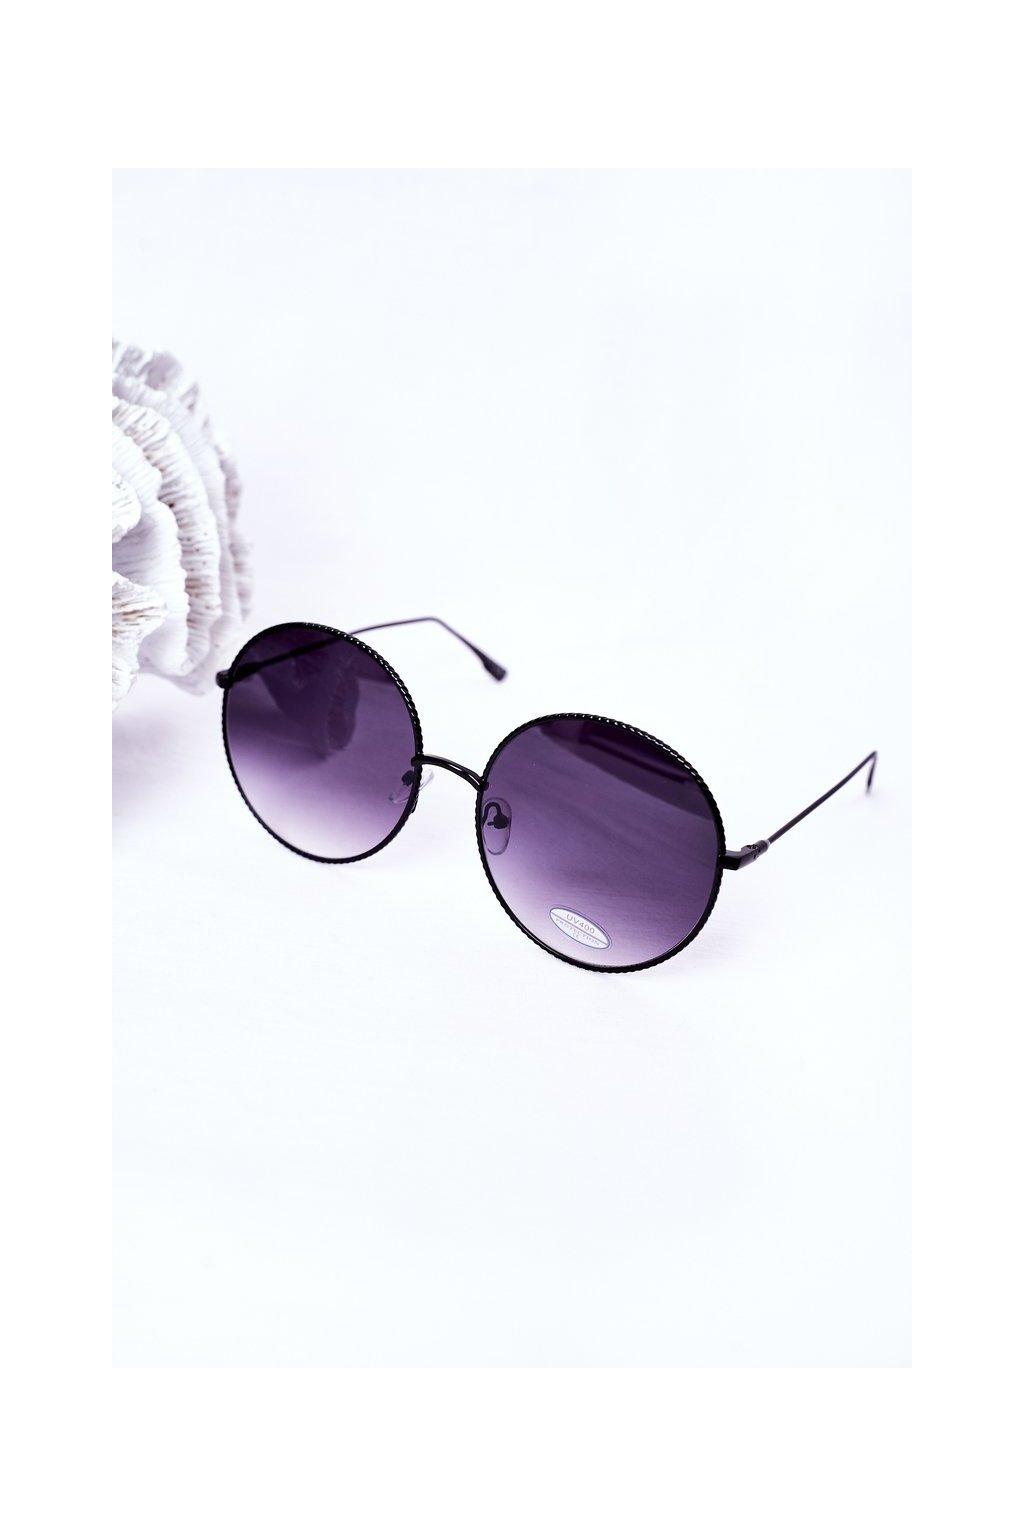 Módne slnečné okuliare LOOKS STYLE čierne LOOKS001 BLACK